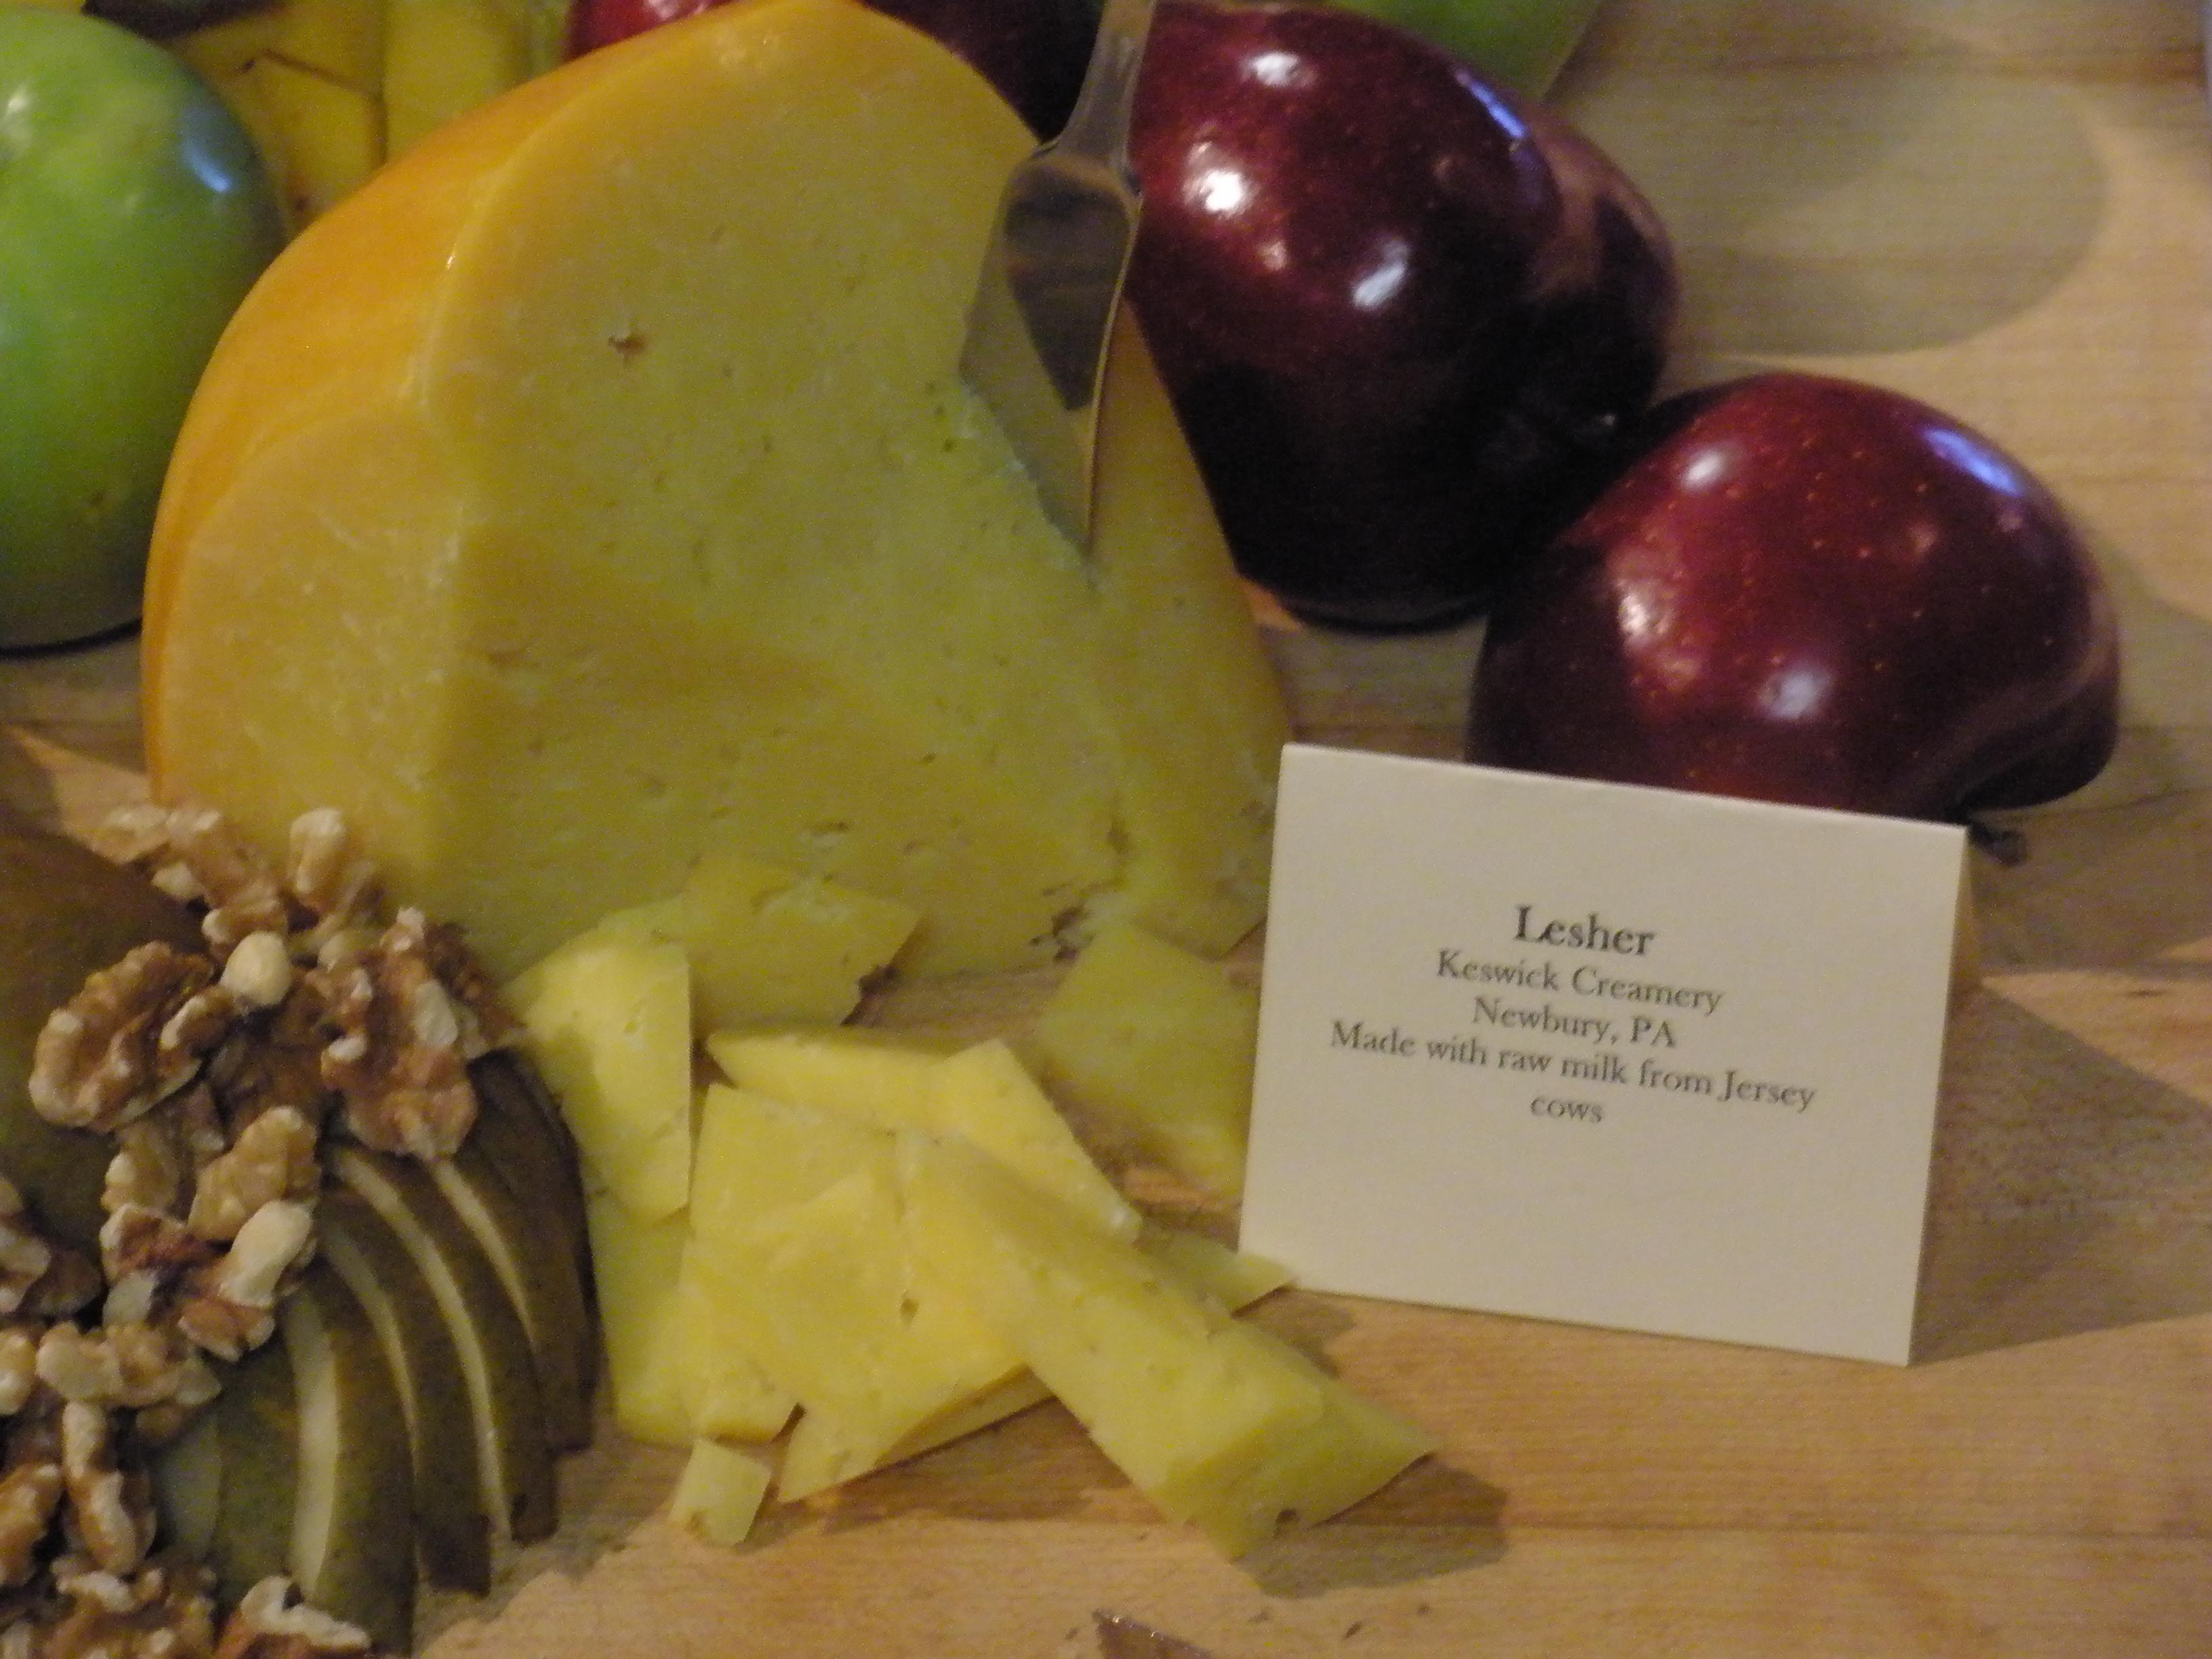 Lesher cheese